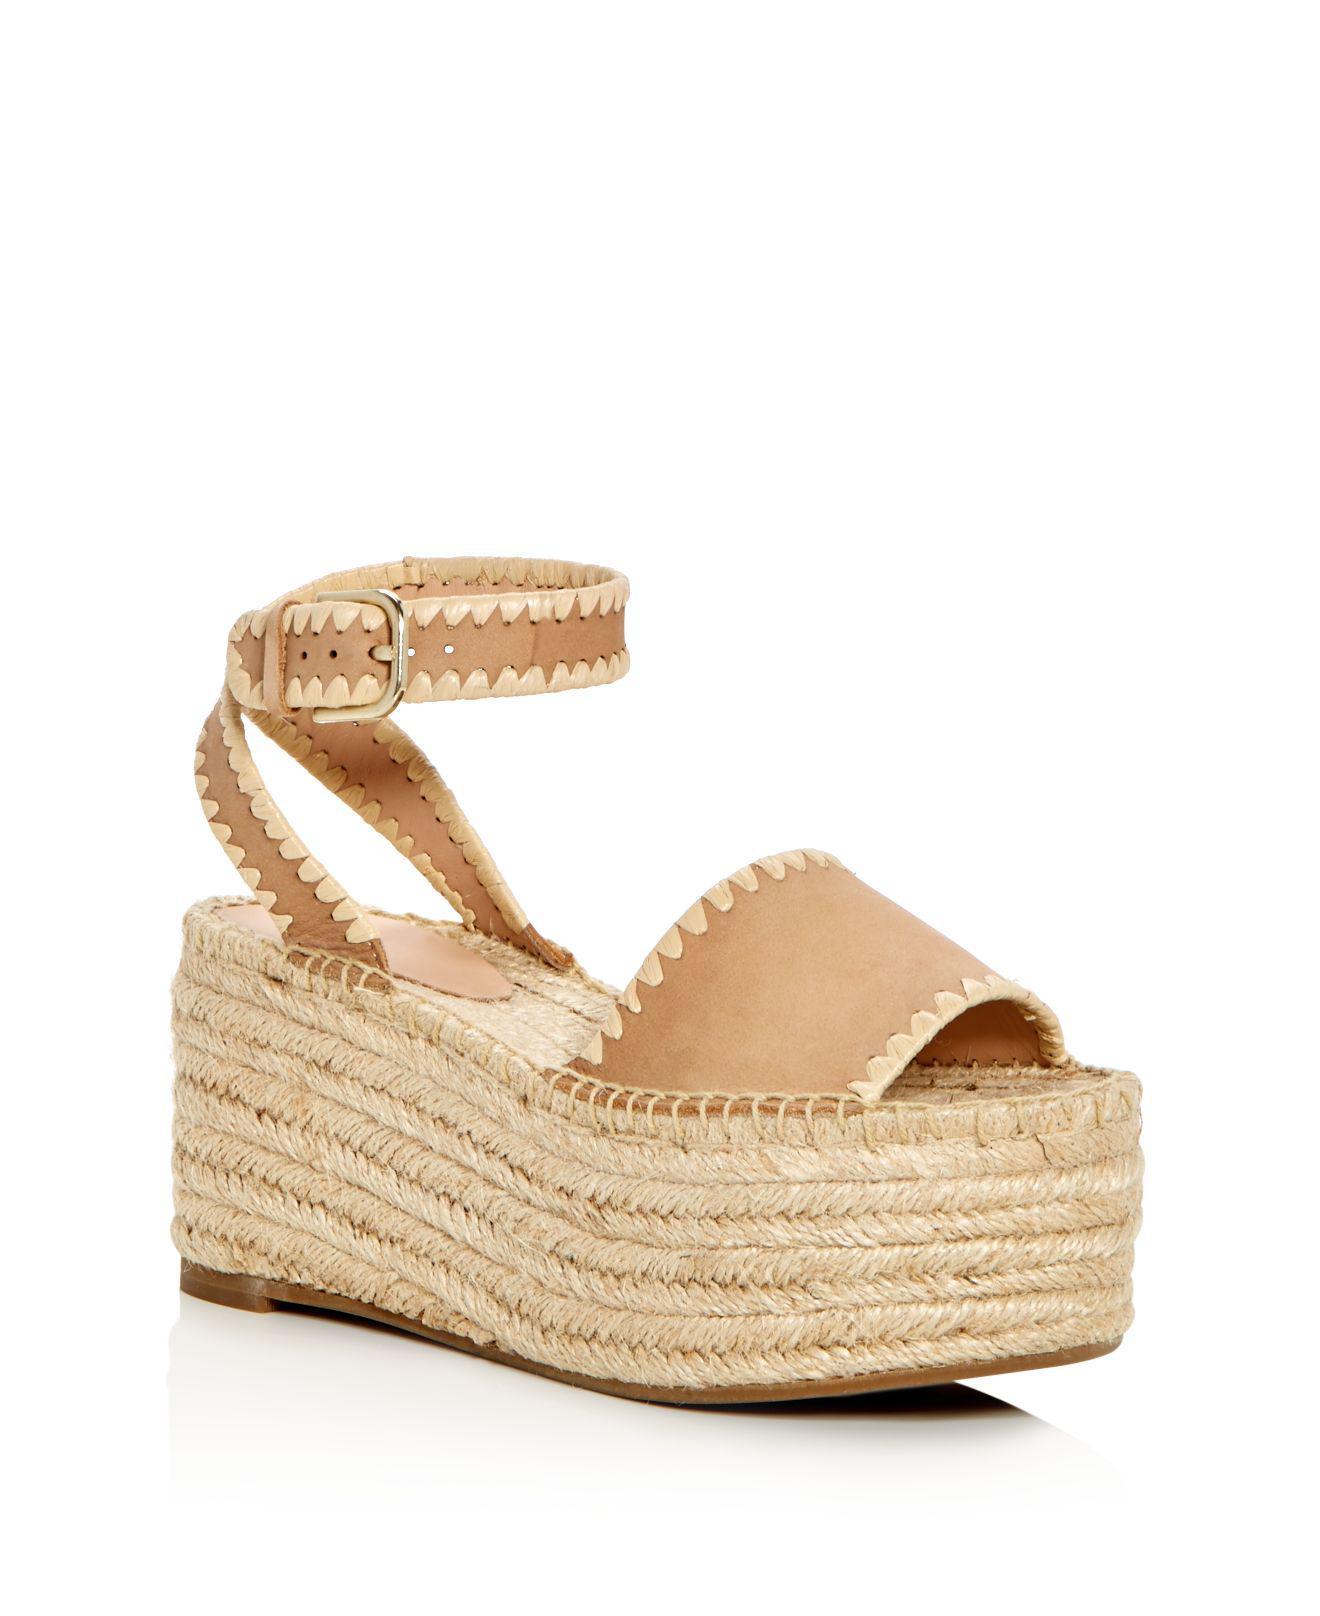 Pour La Victoire Women's Ria Suede & Raffia Espadrille Platform Wedge Sandals Free Shipping With Mastercard Outlet Order Online QhKHuIlmTE